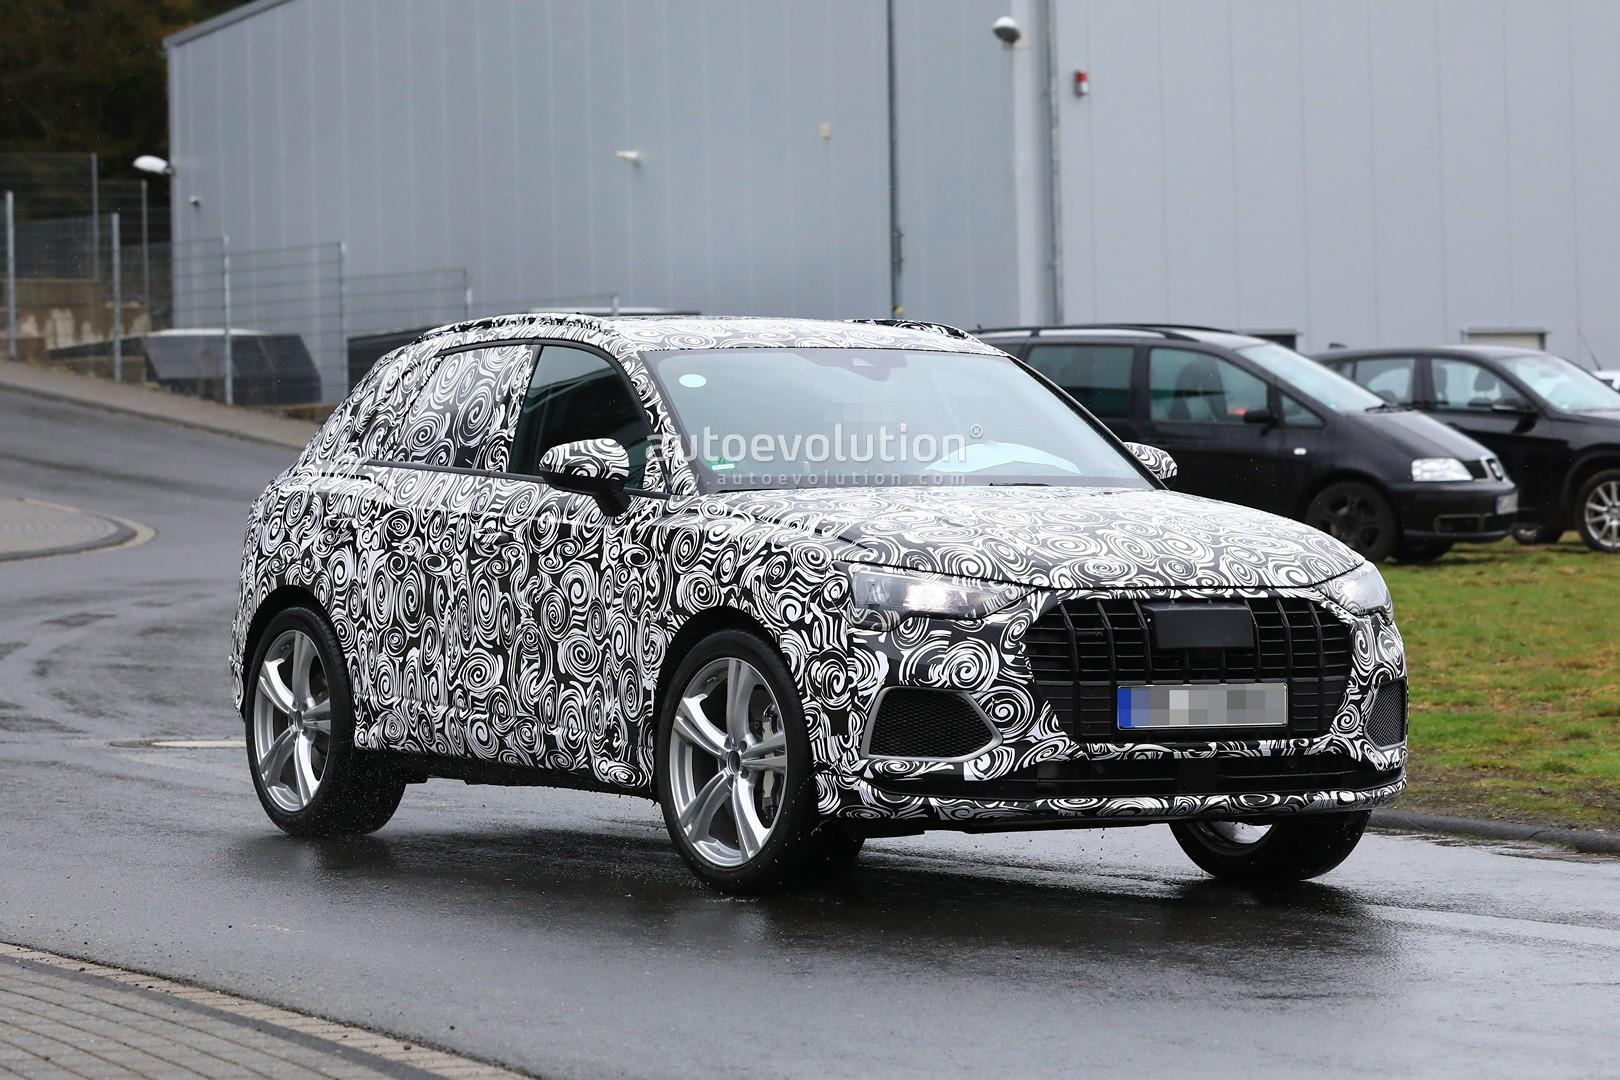 Virat Kohli adds the new Audi RS5 to his garage